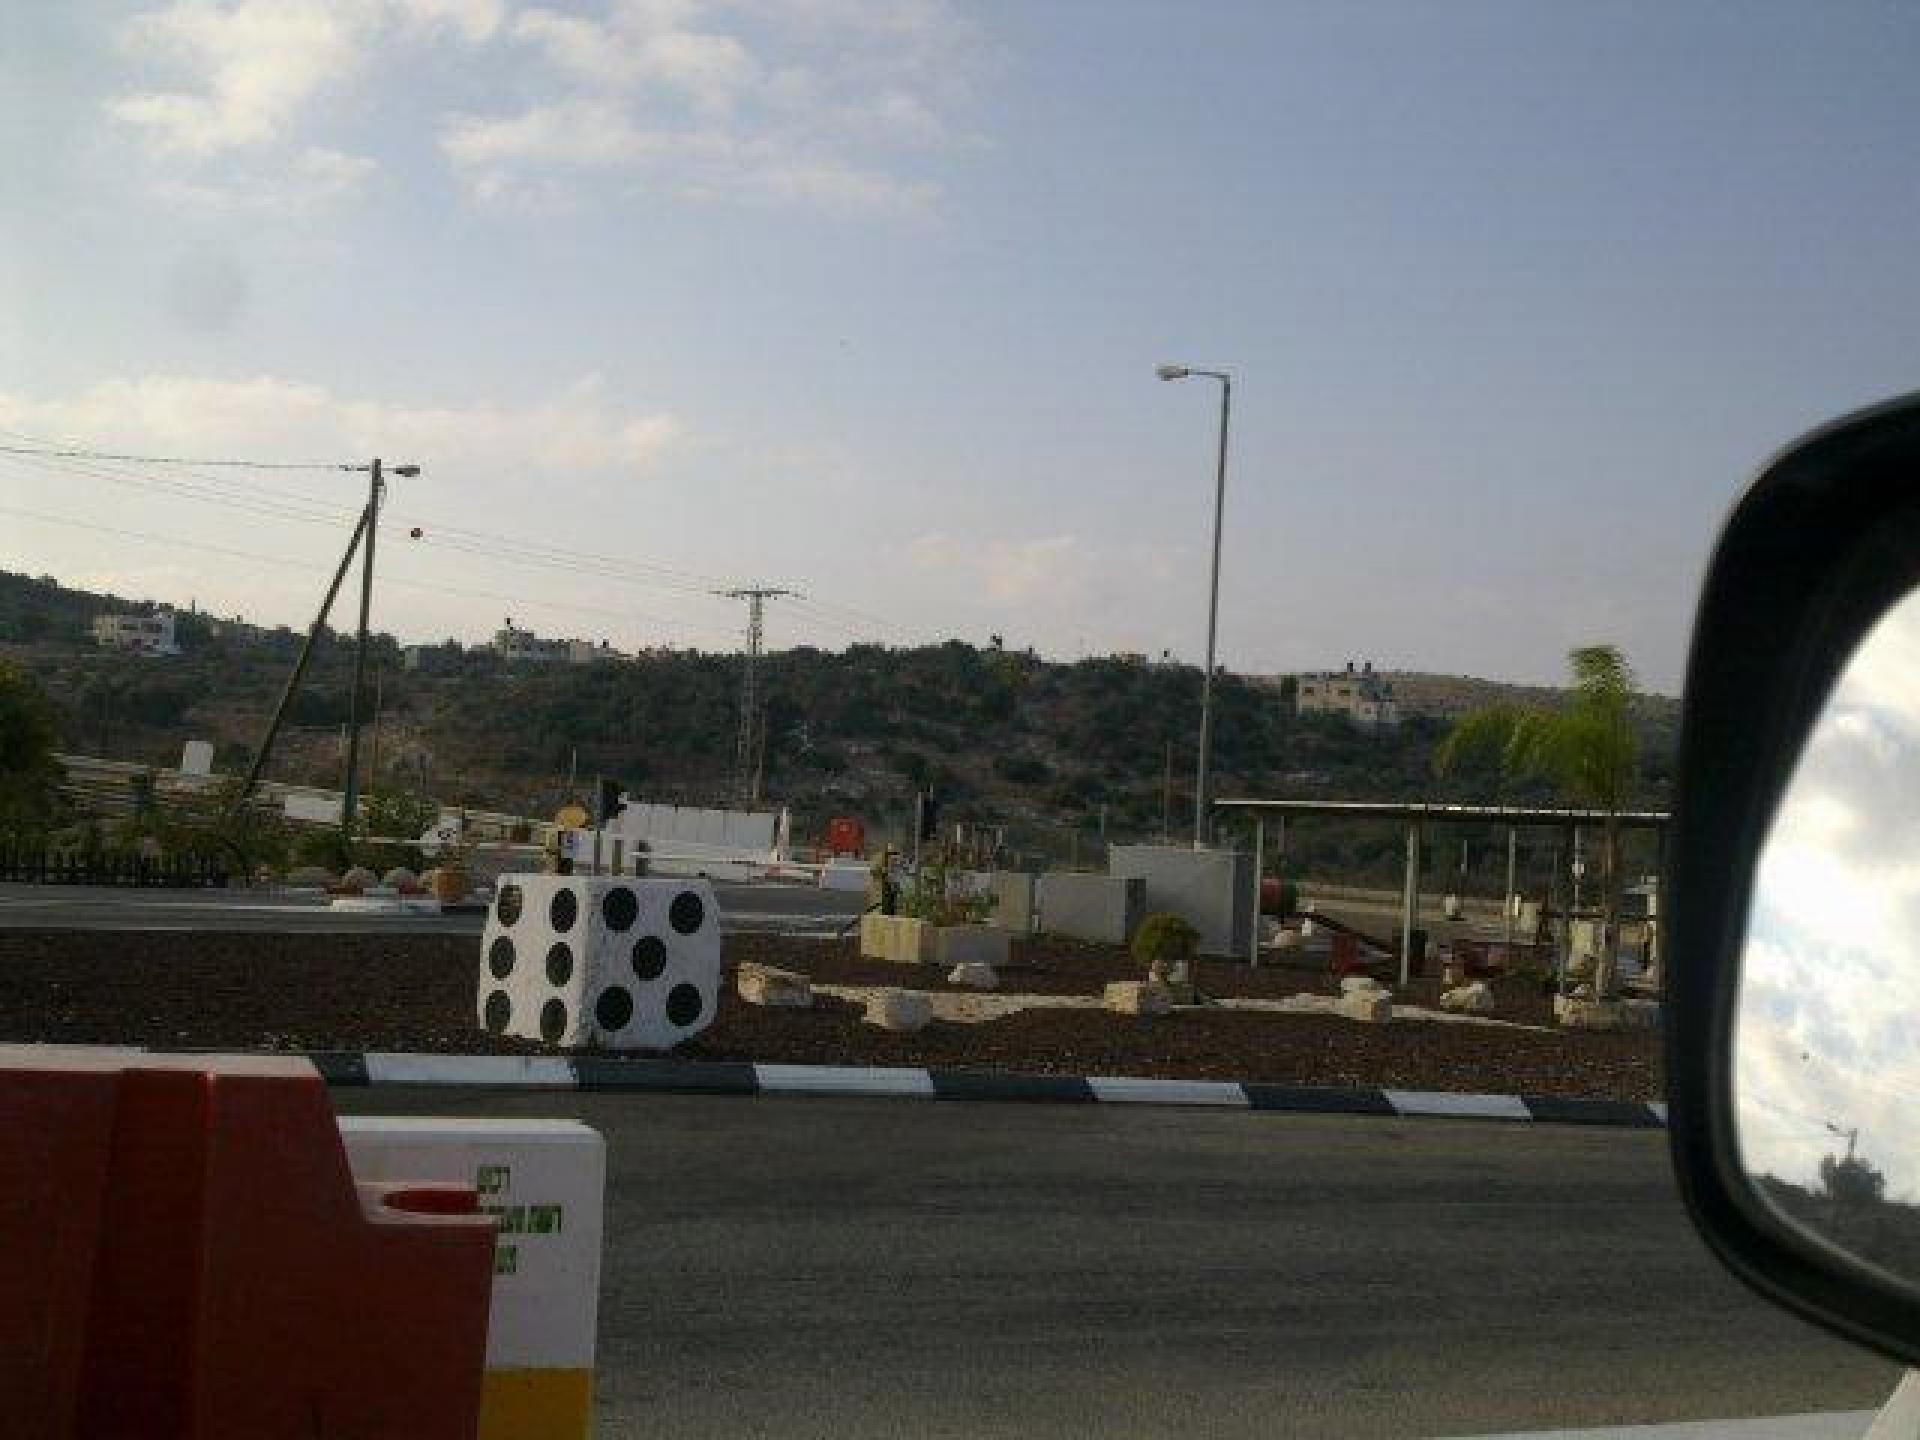 Barta'a/Reikhan checkpoint 18.08.11